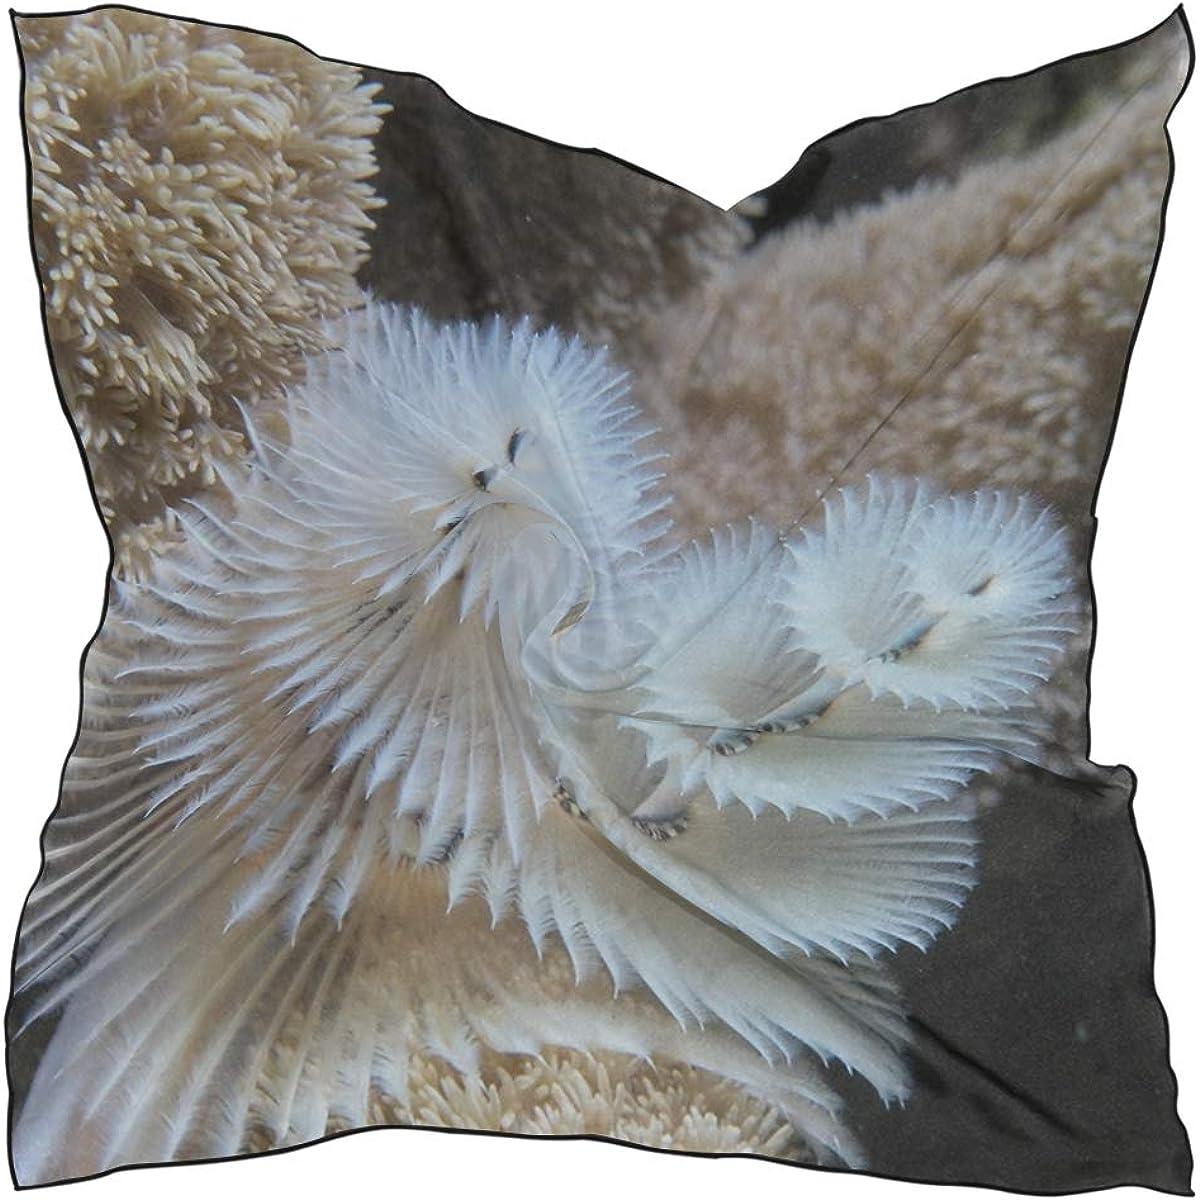 Soft Polyester Silk Scarfs For Women Fashion Print Wild Christmas Tree Worm Cayman Island Reef Neck Scarf Hair Accessories Scarf Head Scarf Men Multiple Ways Of Wearing Daily Decor